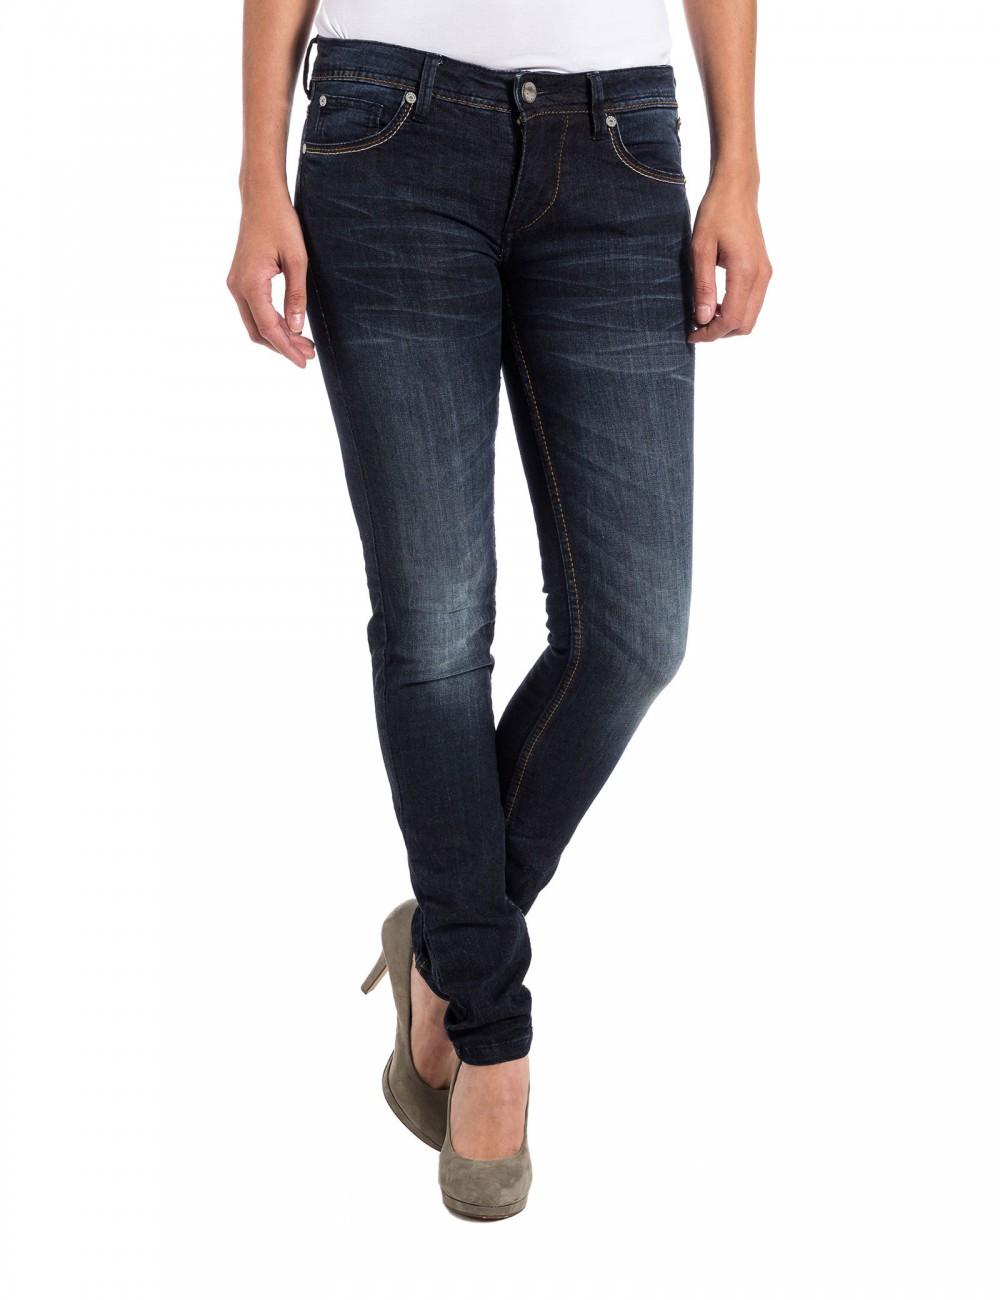 timezone damen jeans aleenatz 16 5471 tight fit raywash ebay. Black Bedroom Furniture Sets. Home Design Ideas